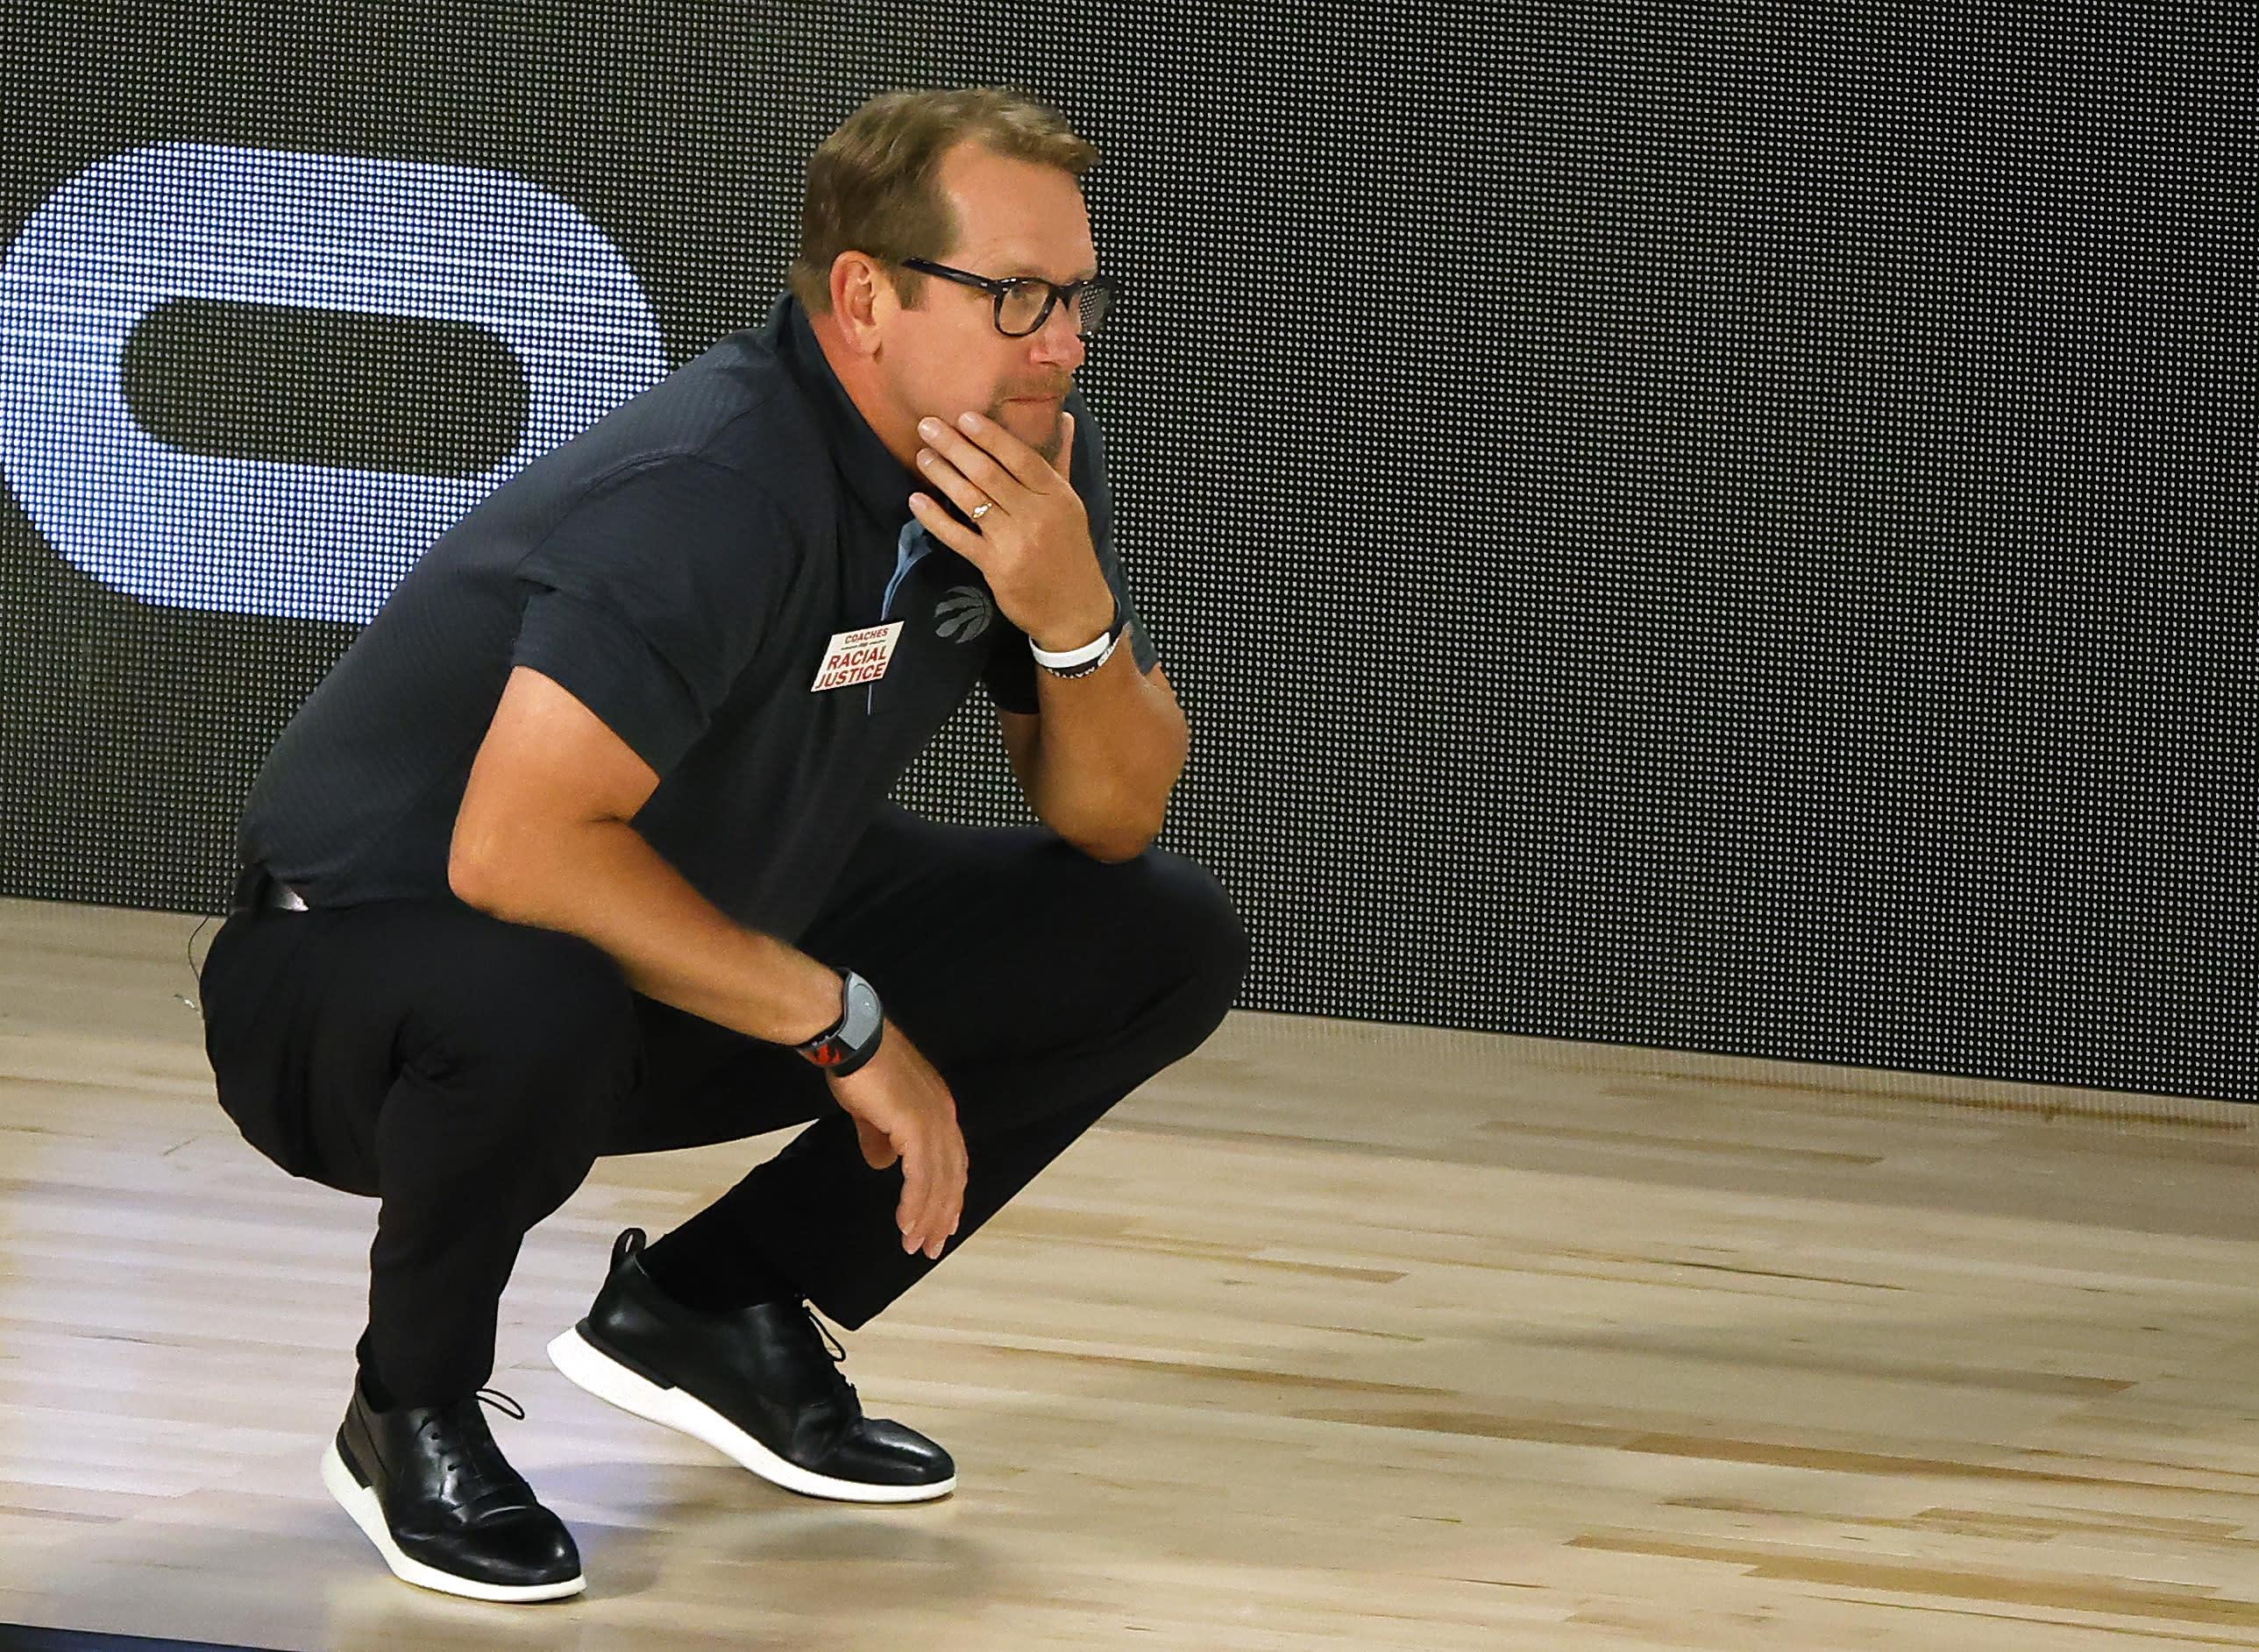 Toronto Raptors' Nick Nurse voted NBA Coach of the Year